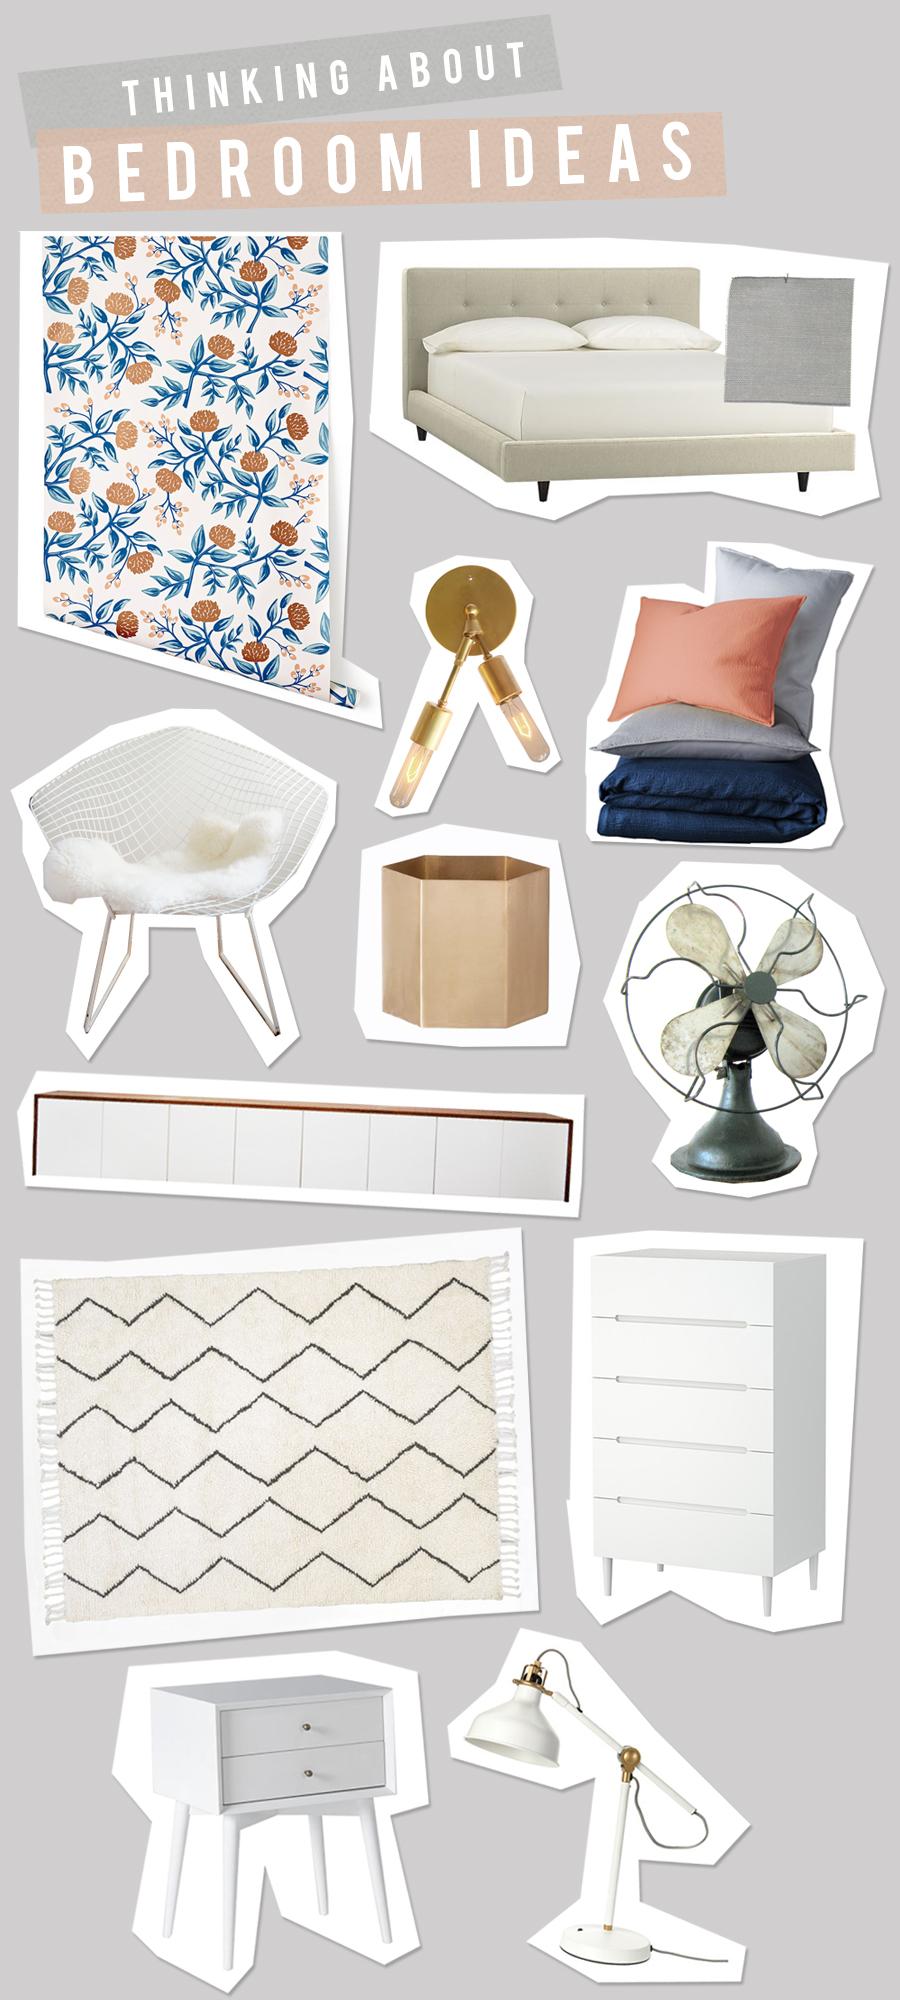 Vintage Modern Bedroom Idea Board